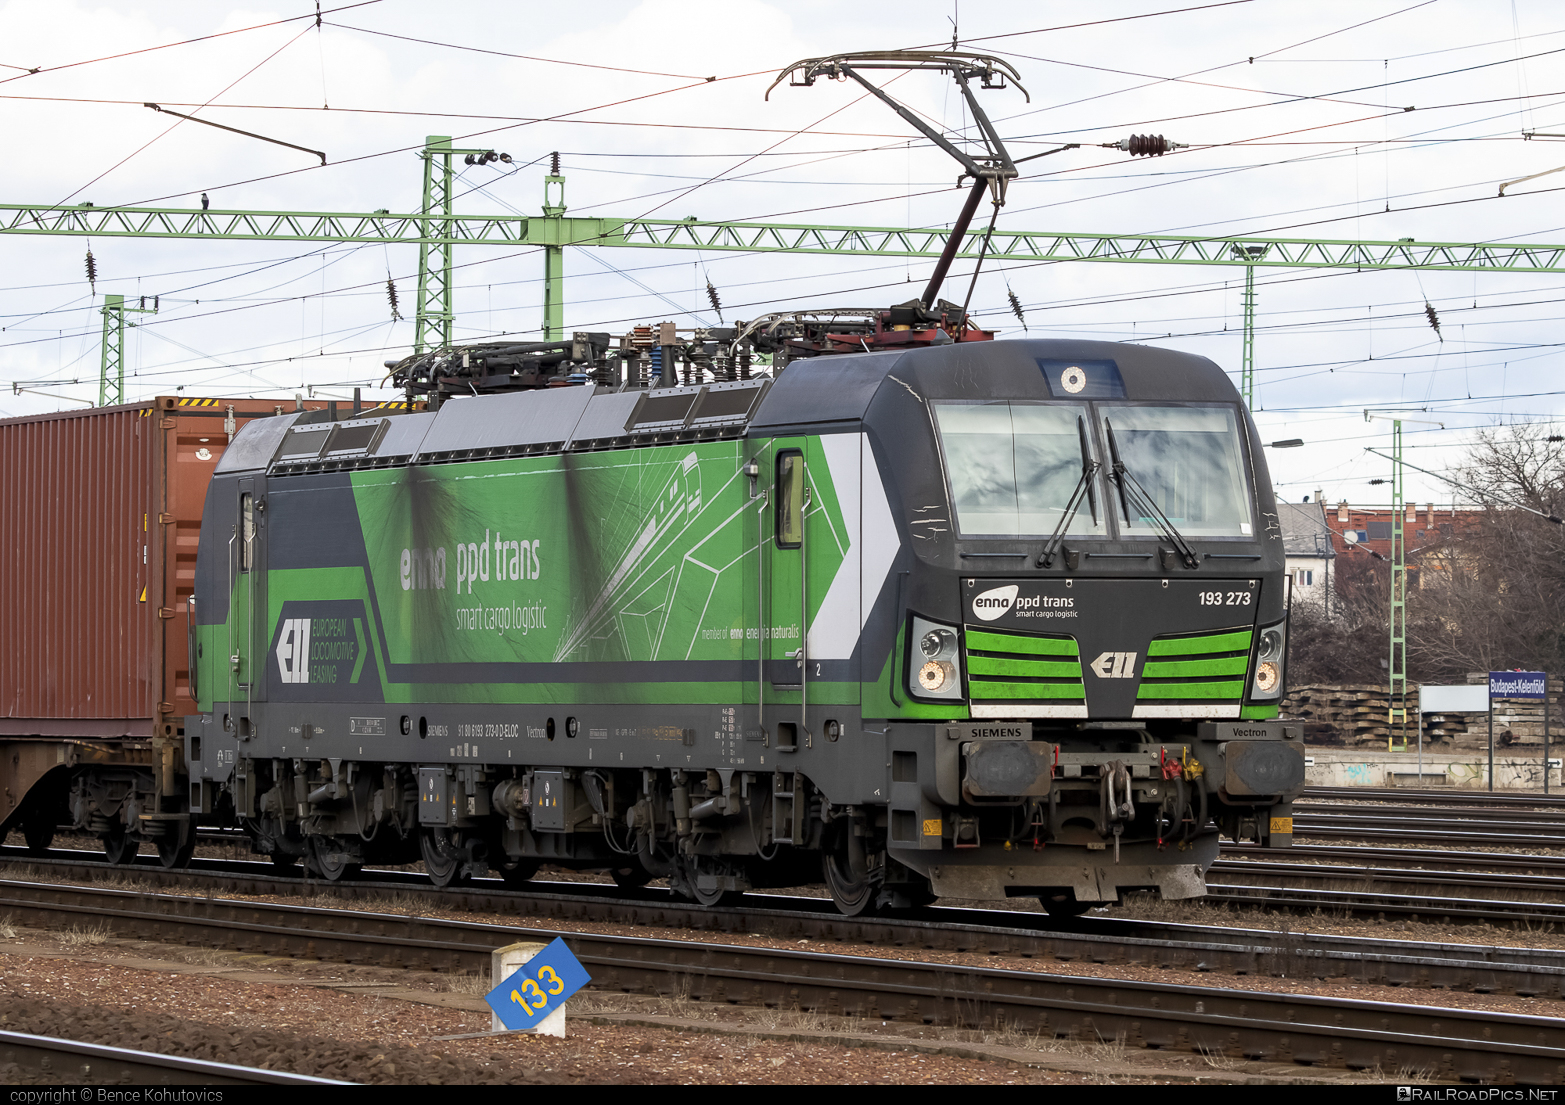 Siemens Vectron MS - 193 273-0 operated by ENNA TRANSPORT d.o.o. za prijevoz tereta #ell #ellgermany #eloc #enna #europeanlocomotiveleasing #siemens #siemensvectron #siemensvectronms #vectron #vectronms